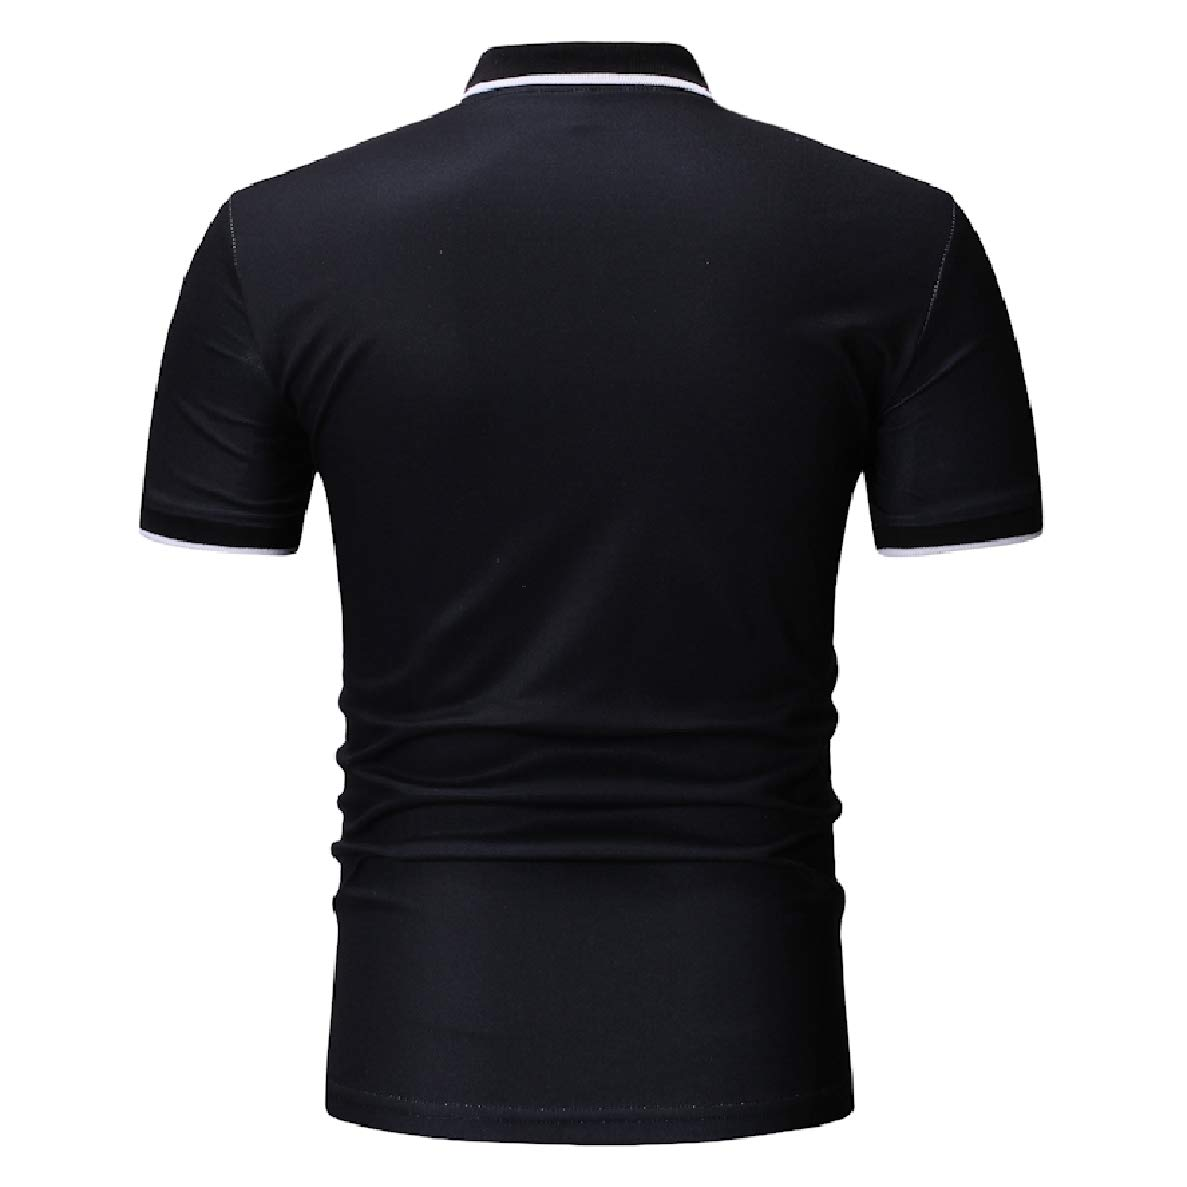 Winwinus Men Fashion Lapel T-Shirts Short-Sleeve Letter Printed Polo Shirt